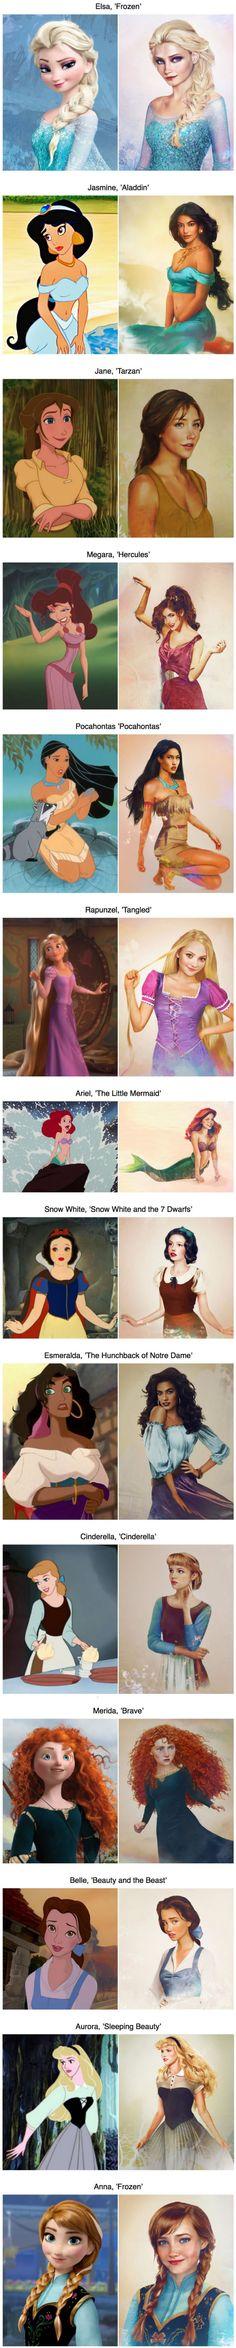 What the real Disney princesses looked like (By Jirka Väätäinen)